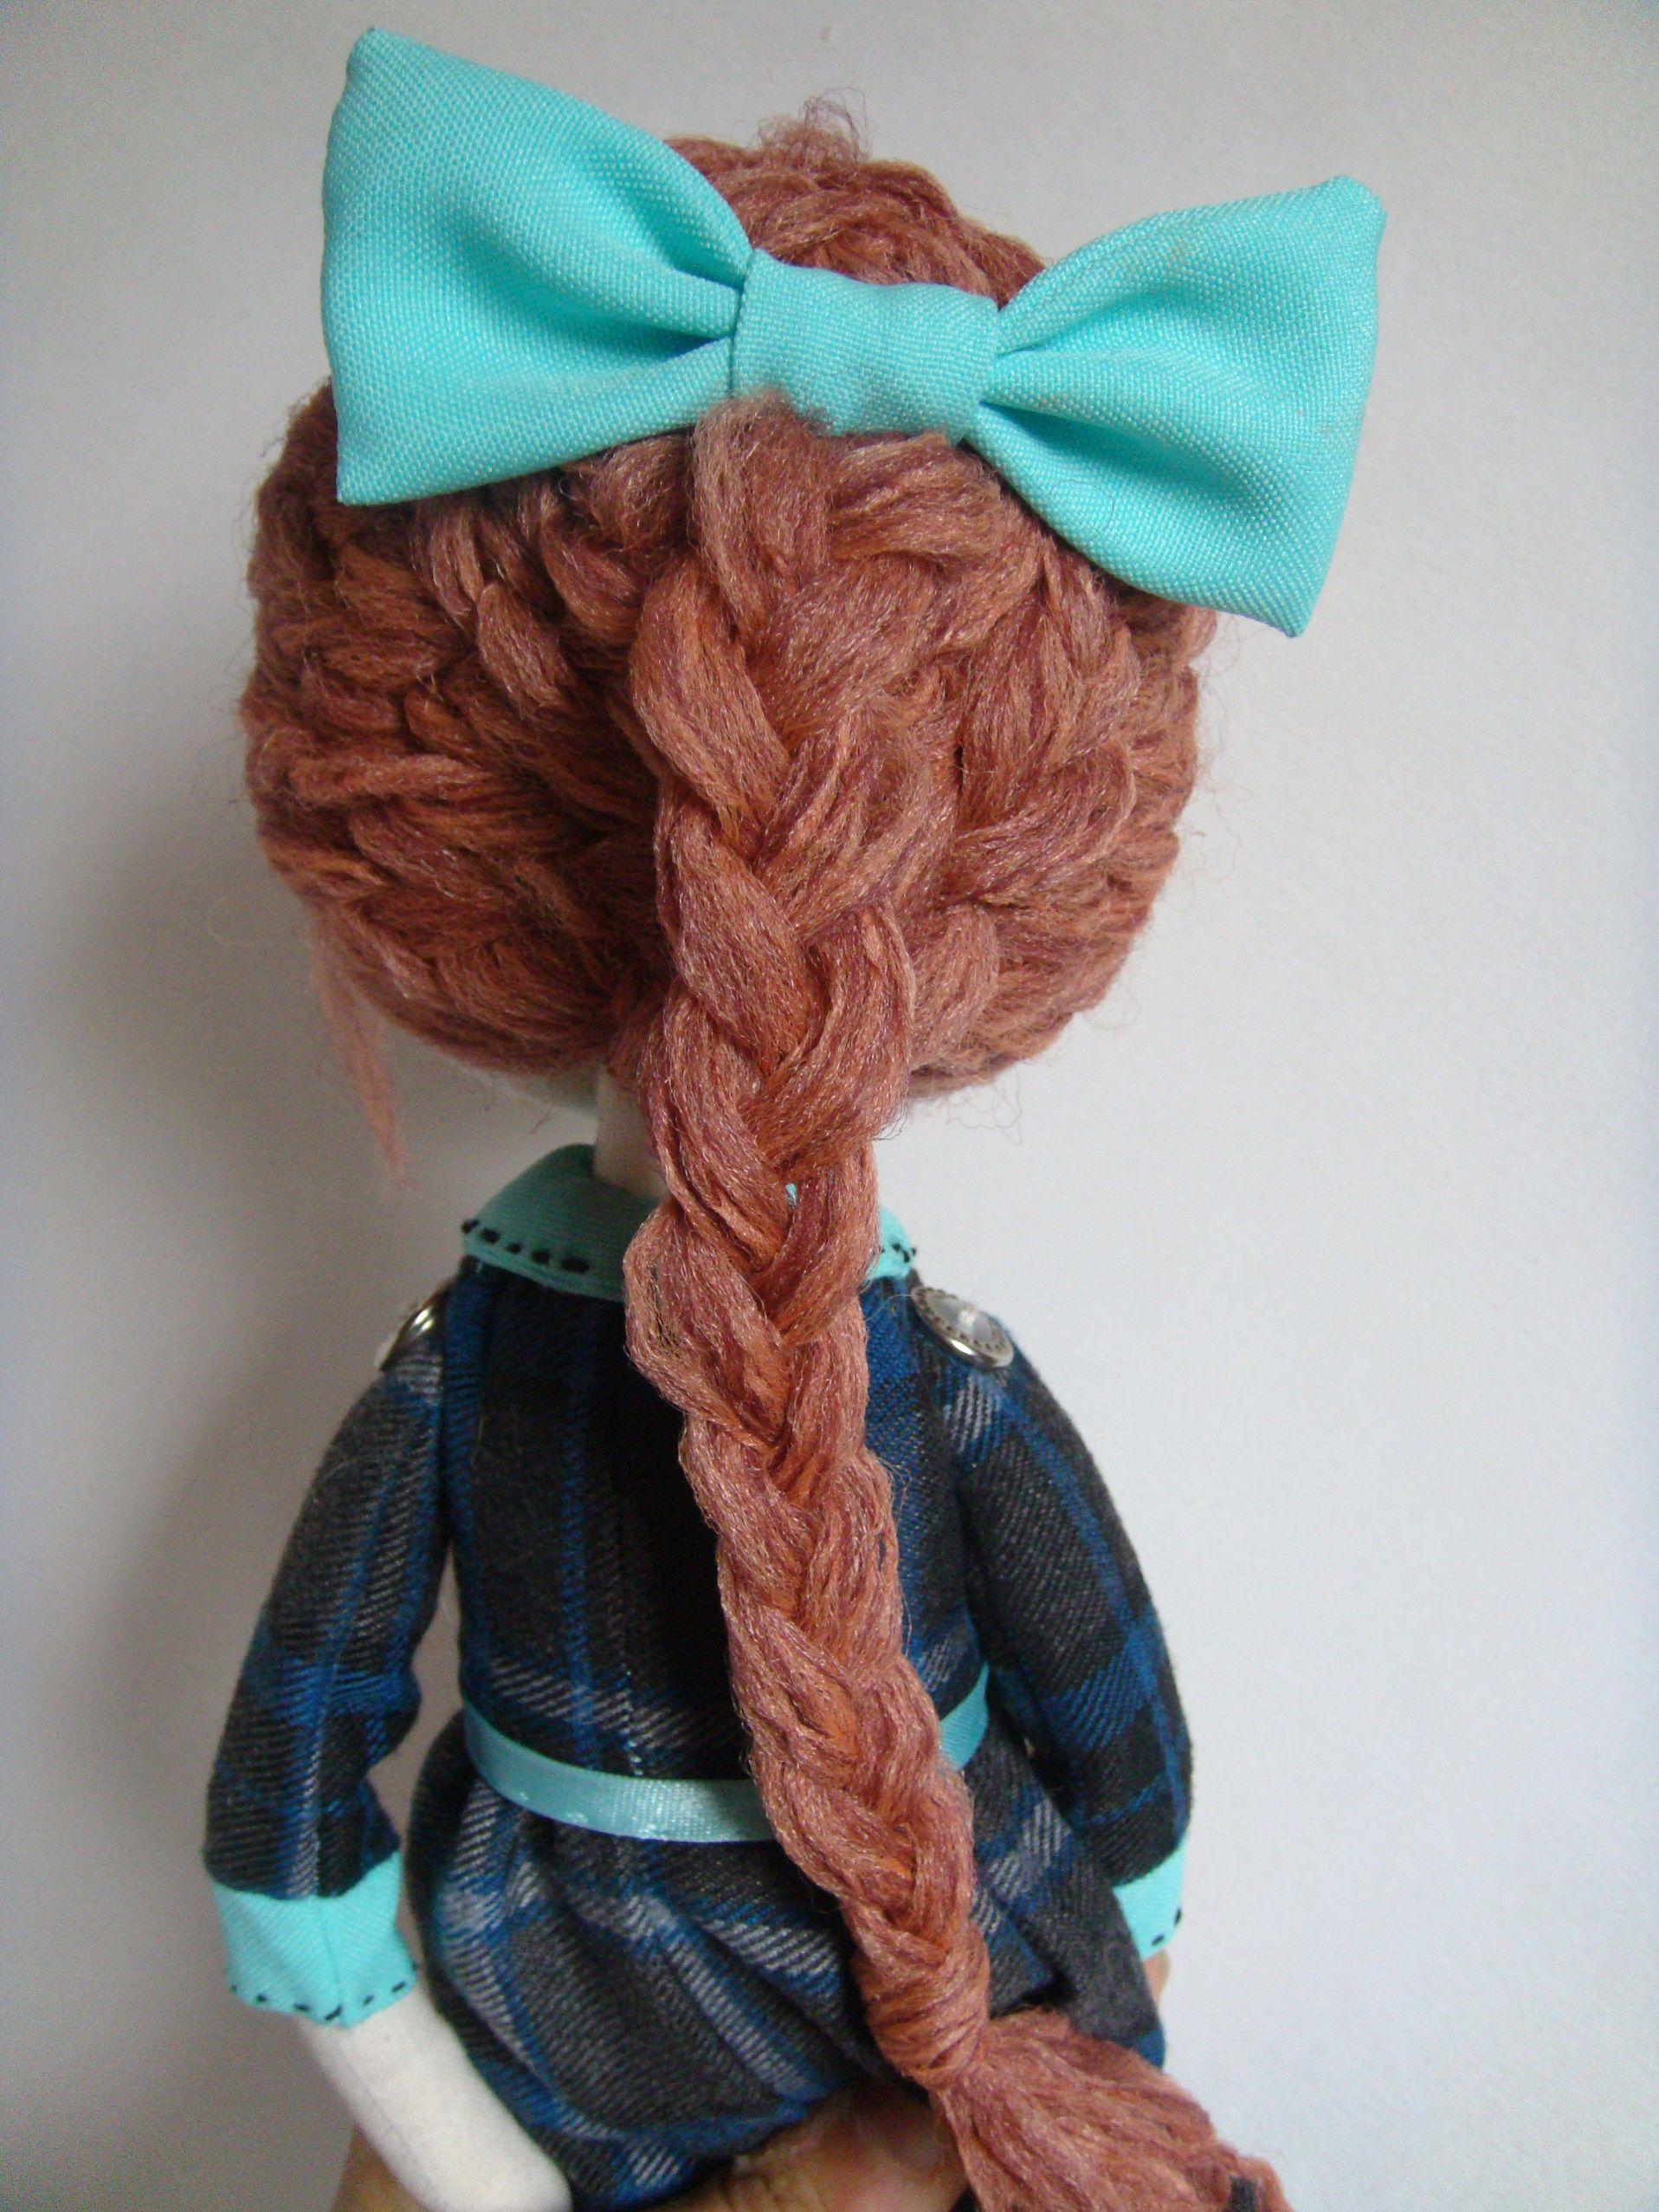 клетка бирюзовый игрушка кукла ручнаяработа купитьподарок подарокдлядевушки handmade платьевклетку  авторскаякукла ирландия талисманоберегдекордизайнинтерьераукрашениеинтерьерарыжая купитькуклу подарокдлядевочки интерьернаякукла текстильнаякукла